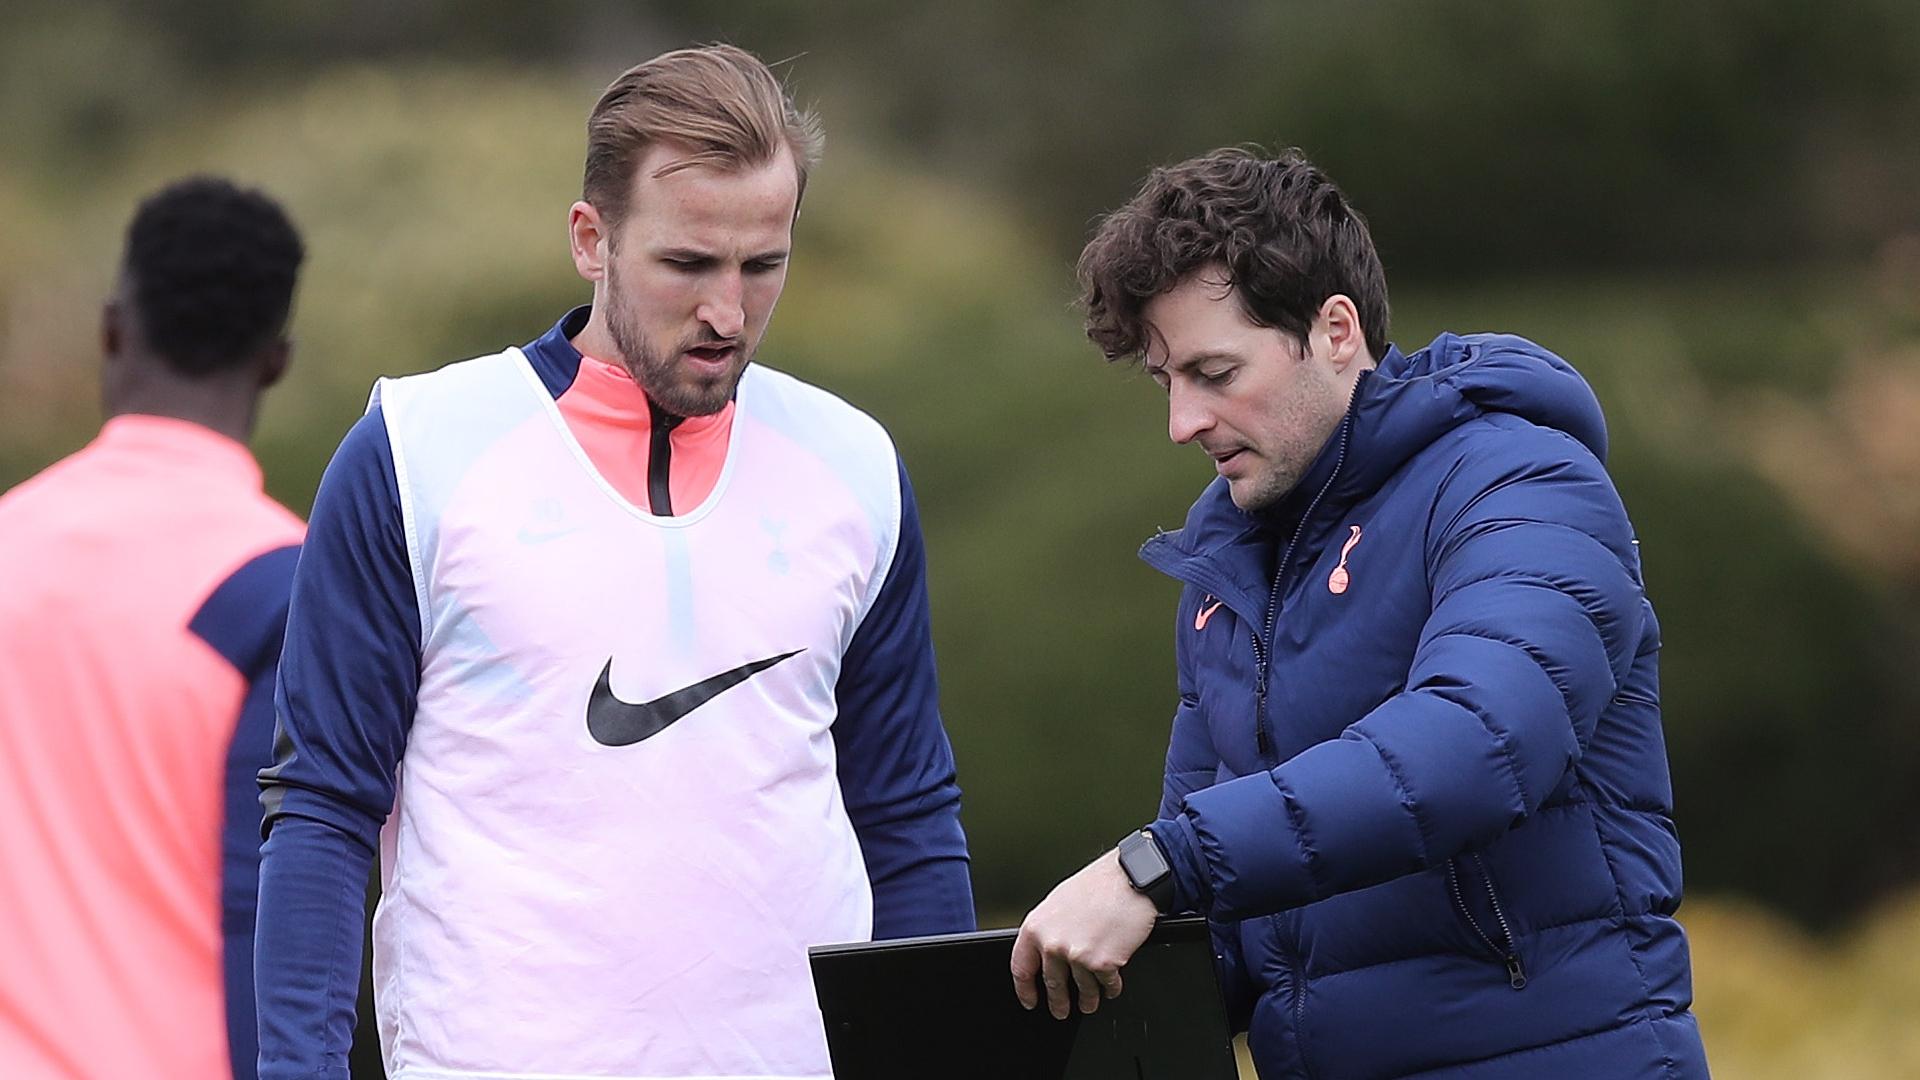 Kane will put Spurs needs over winning Golden Boot, says Mason